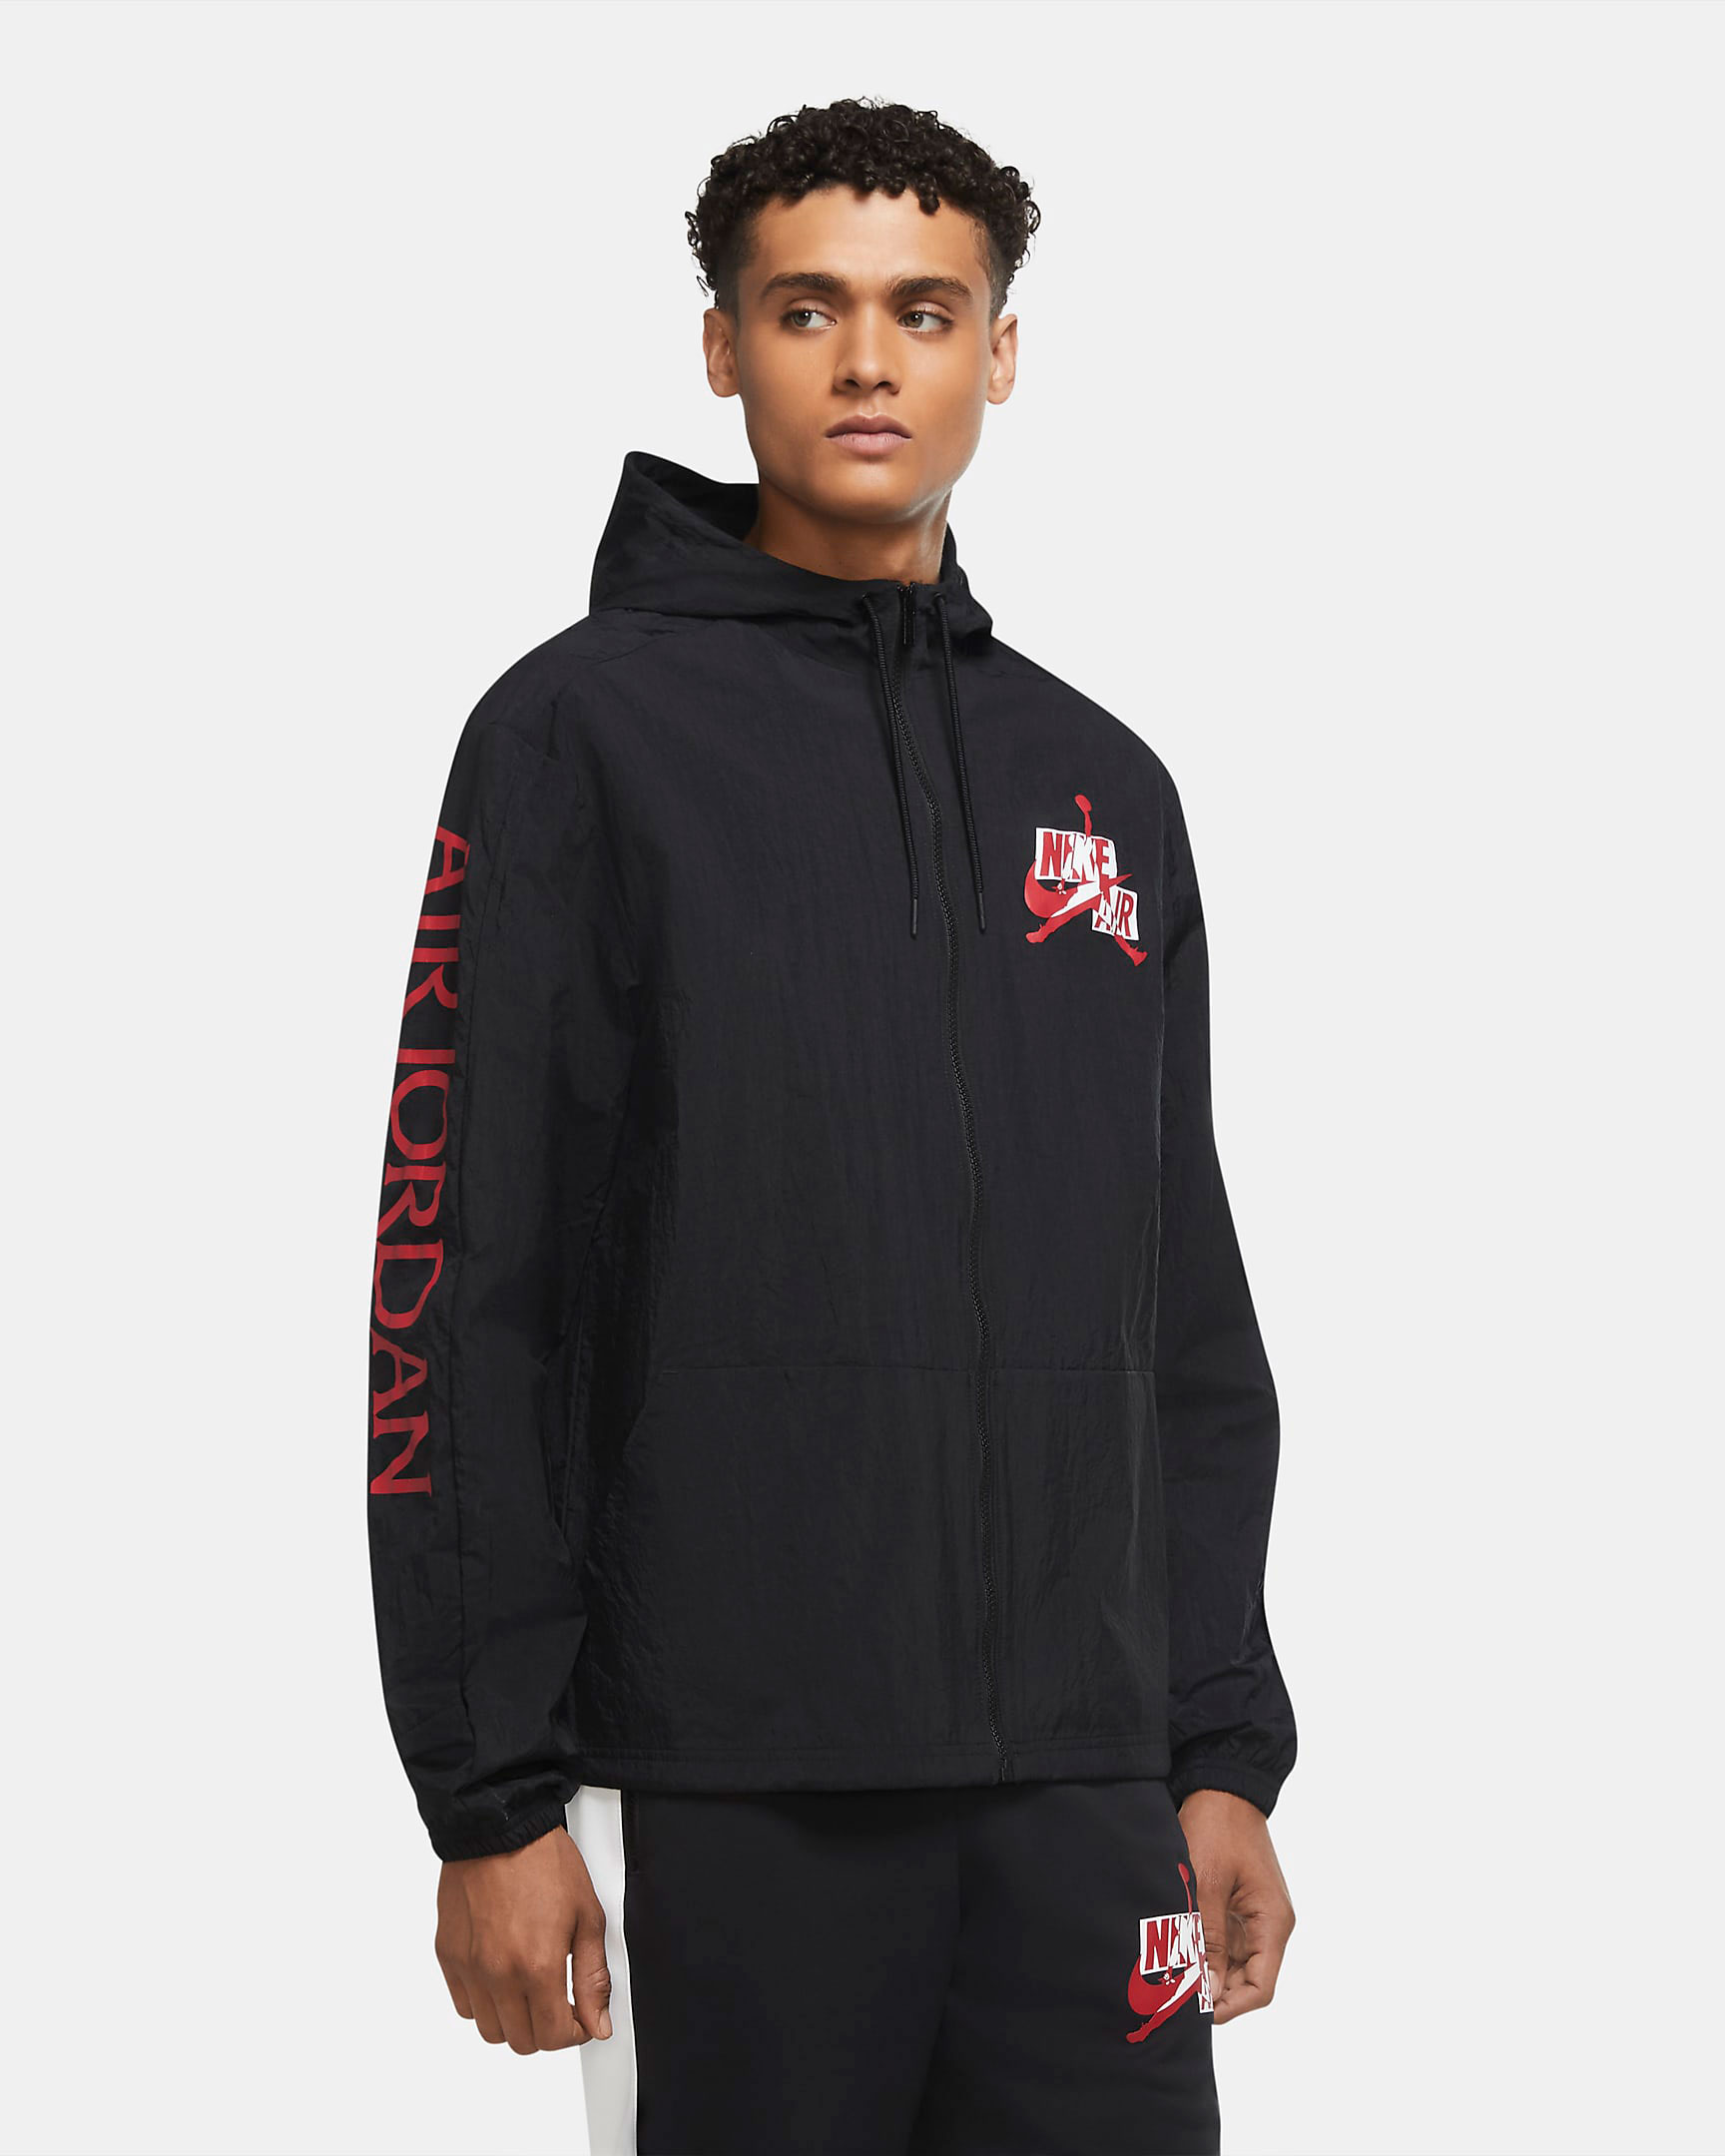 jordan-jumpman-classics-windbreaker-jacket-black-red-1